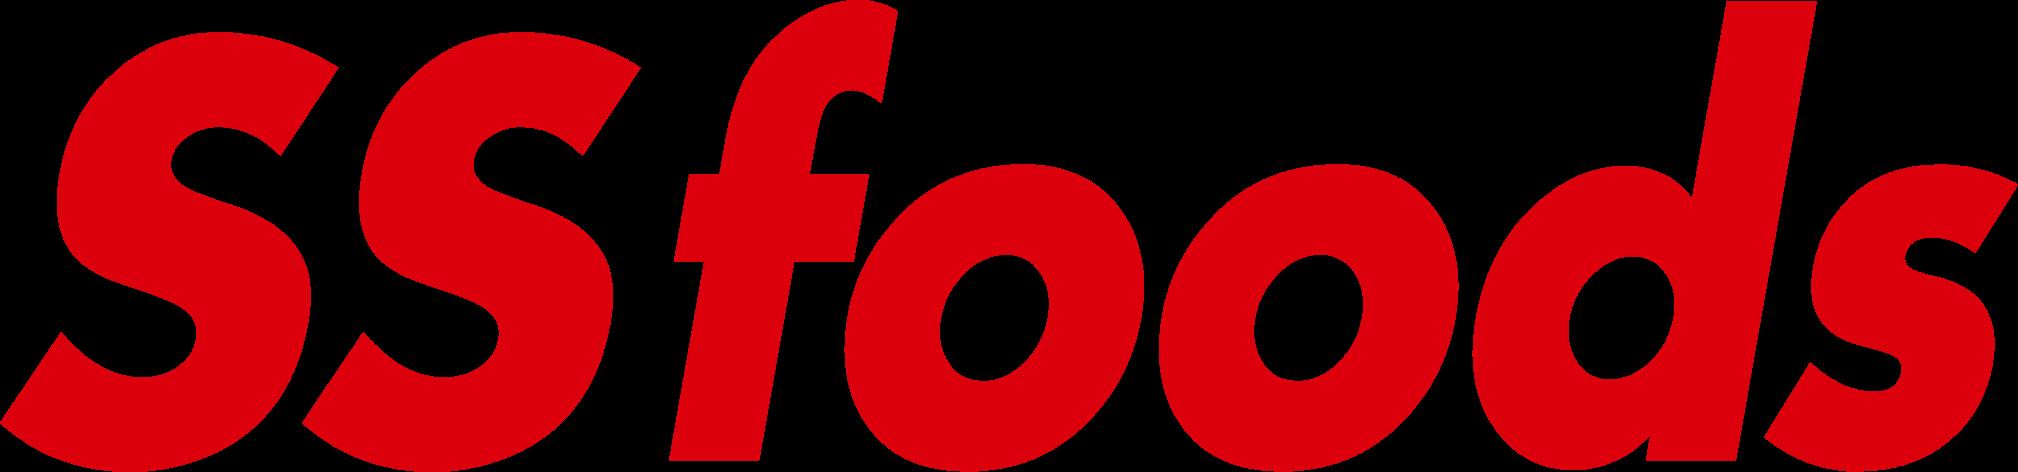 SSfoods SSfoods